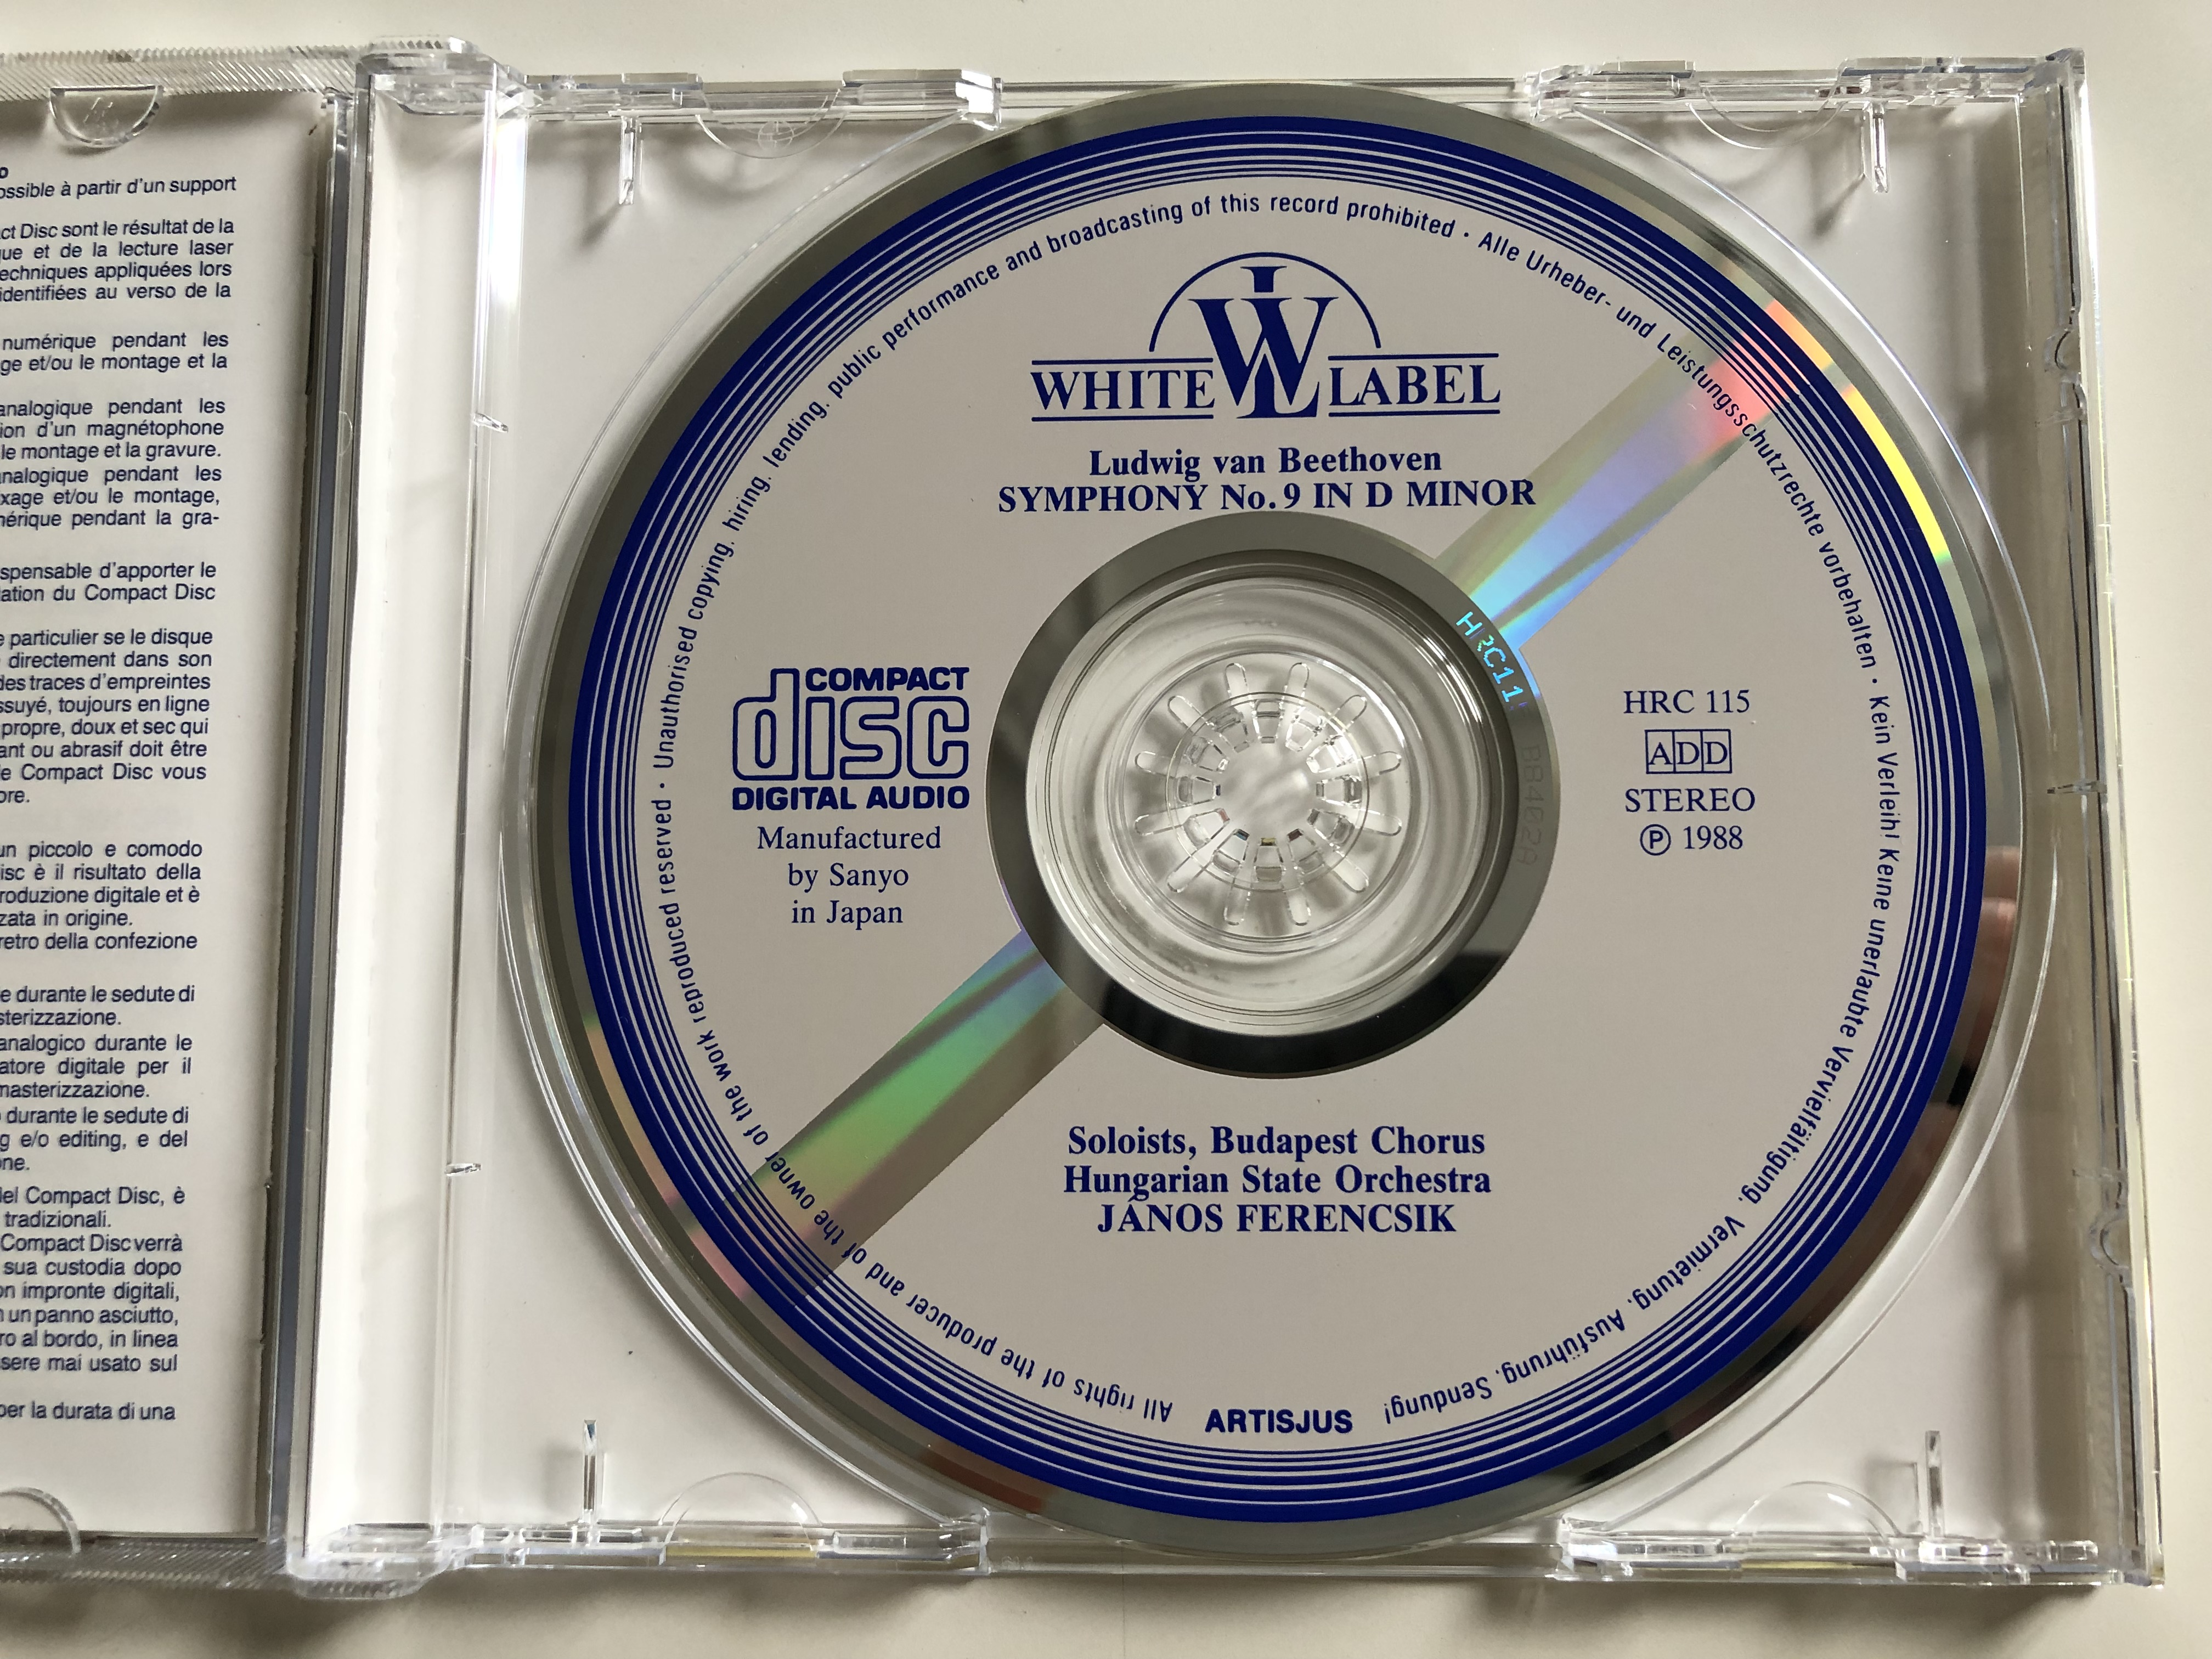 beethoven-symphony-no.-9-va-andor-m-rta-szirmay-gy-rgy-korondi-s-ndor-s-lyom-nagy-budapest-chorus-hungarian-state-orchestra-conducted-by-j-nos-ferencsik-hungaroton-white-label-audio-cd-1988-hrc-115-4-.jpg